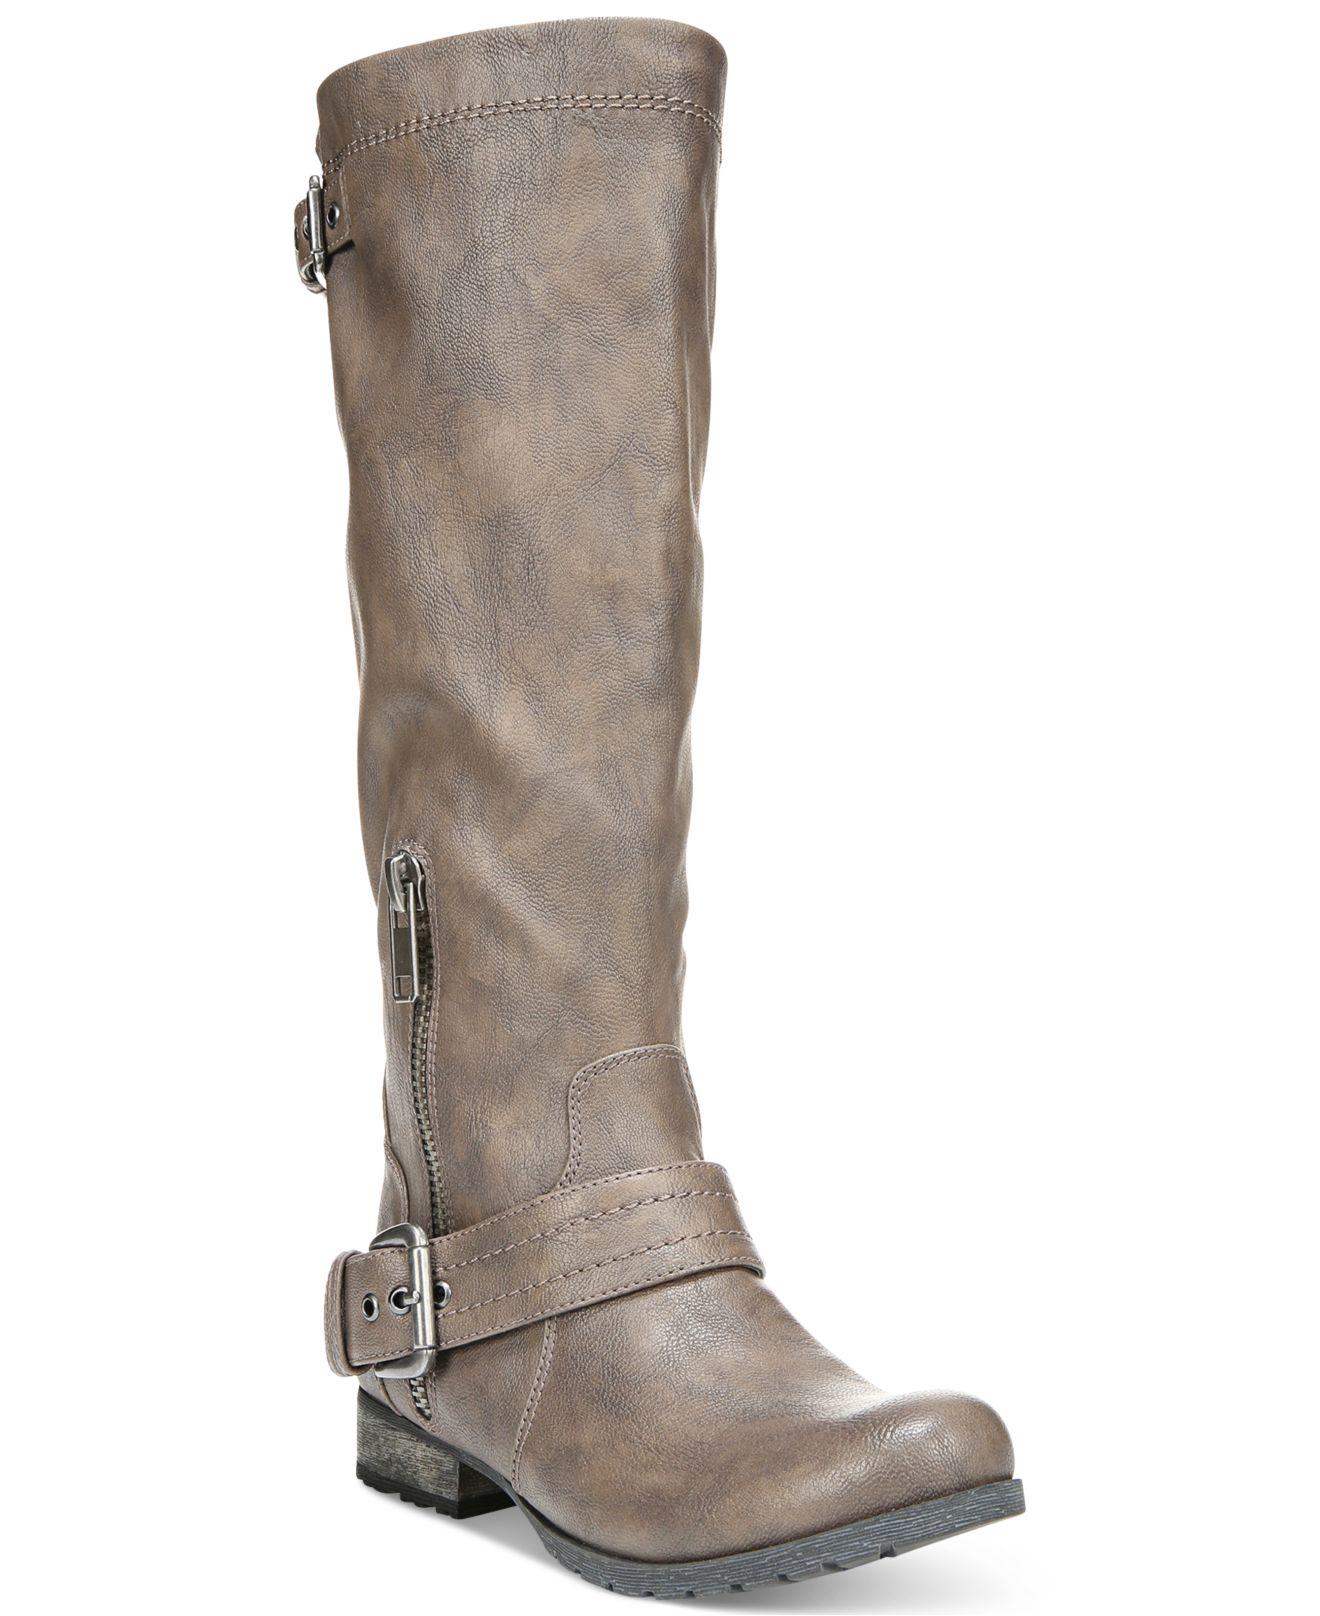 carlos by carlos santana hamilton boots in brown taupe